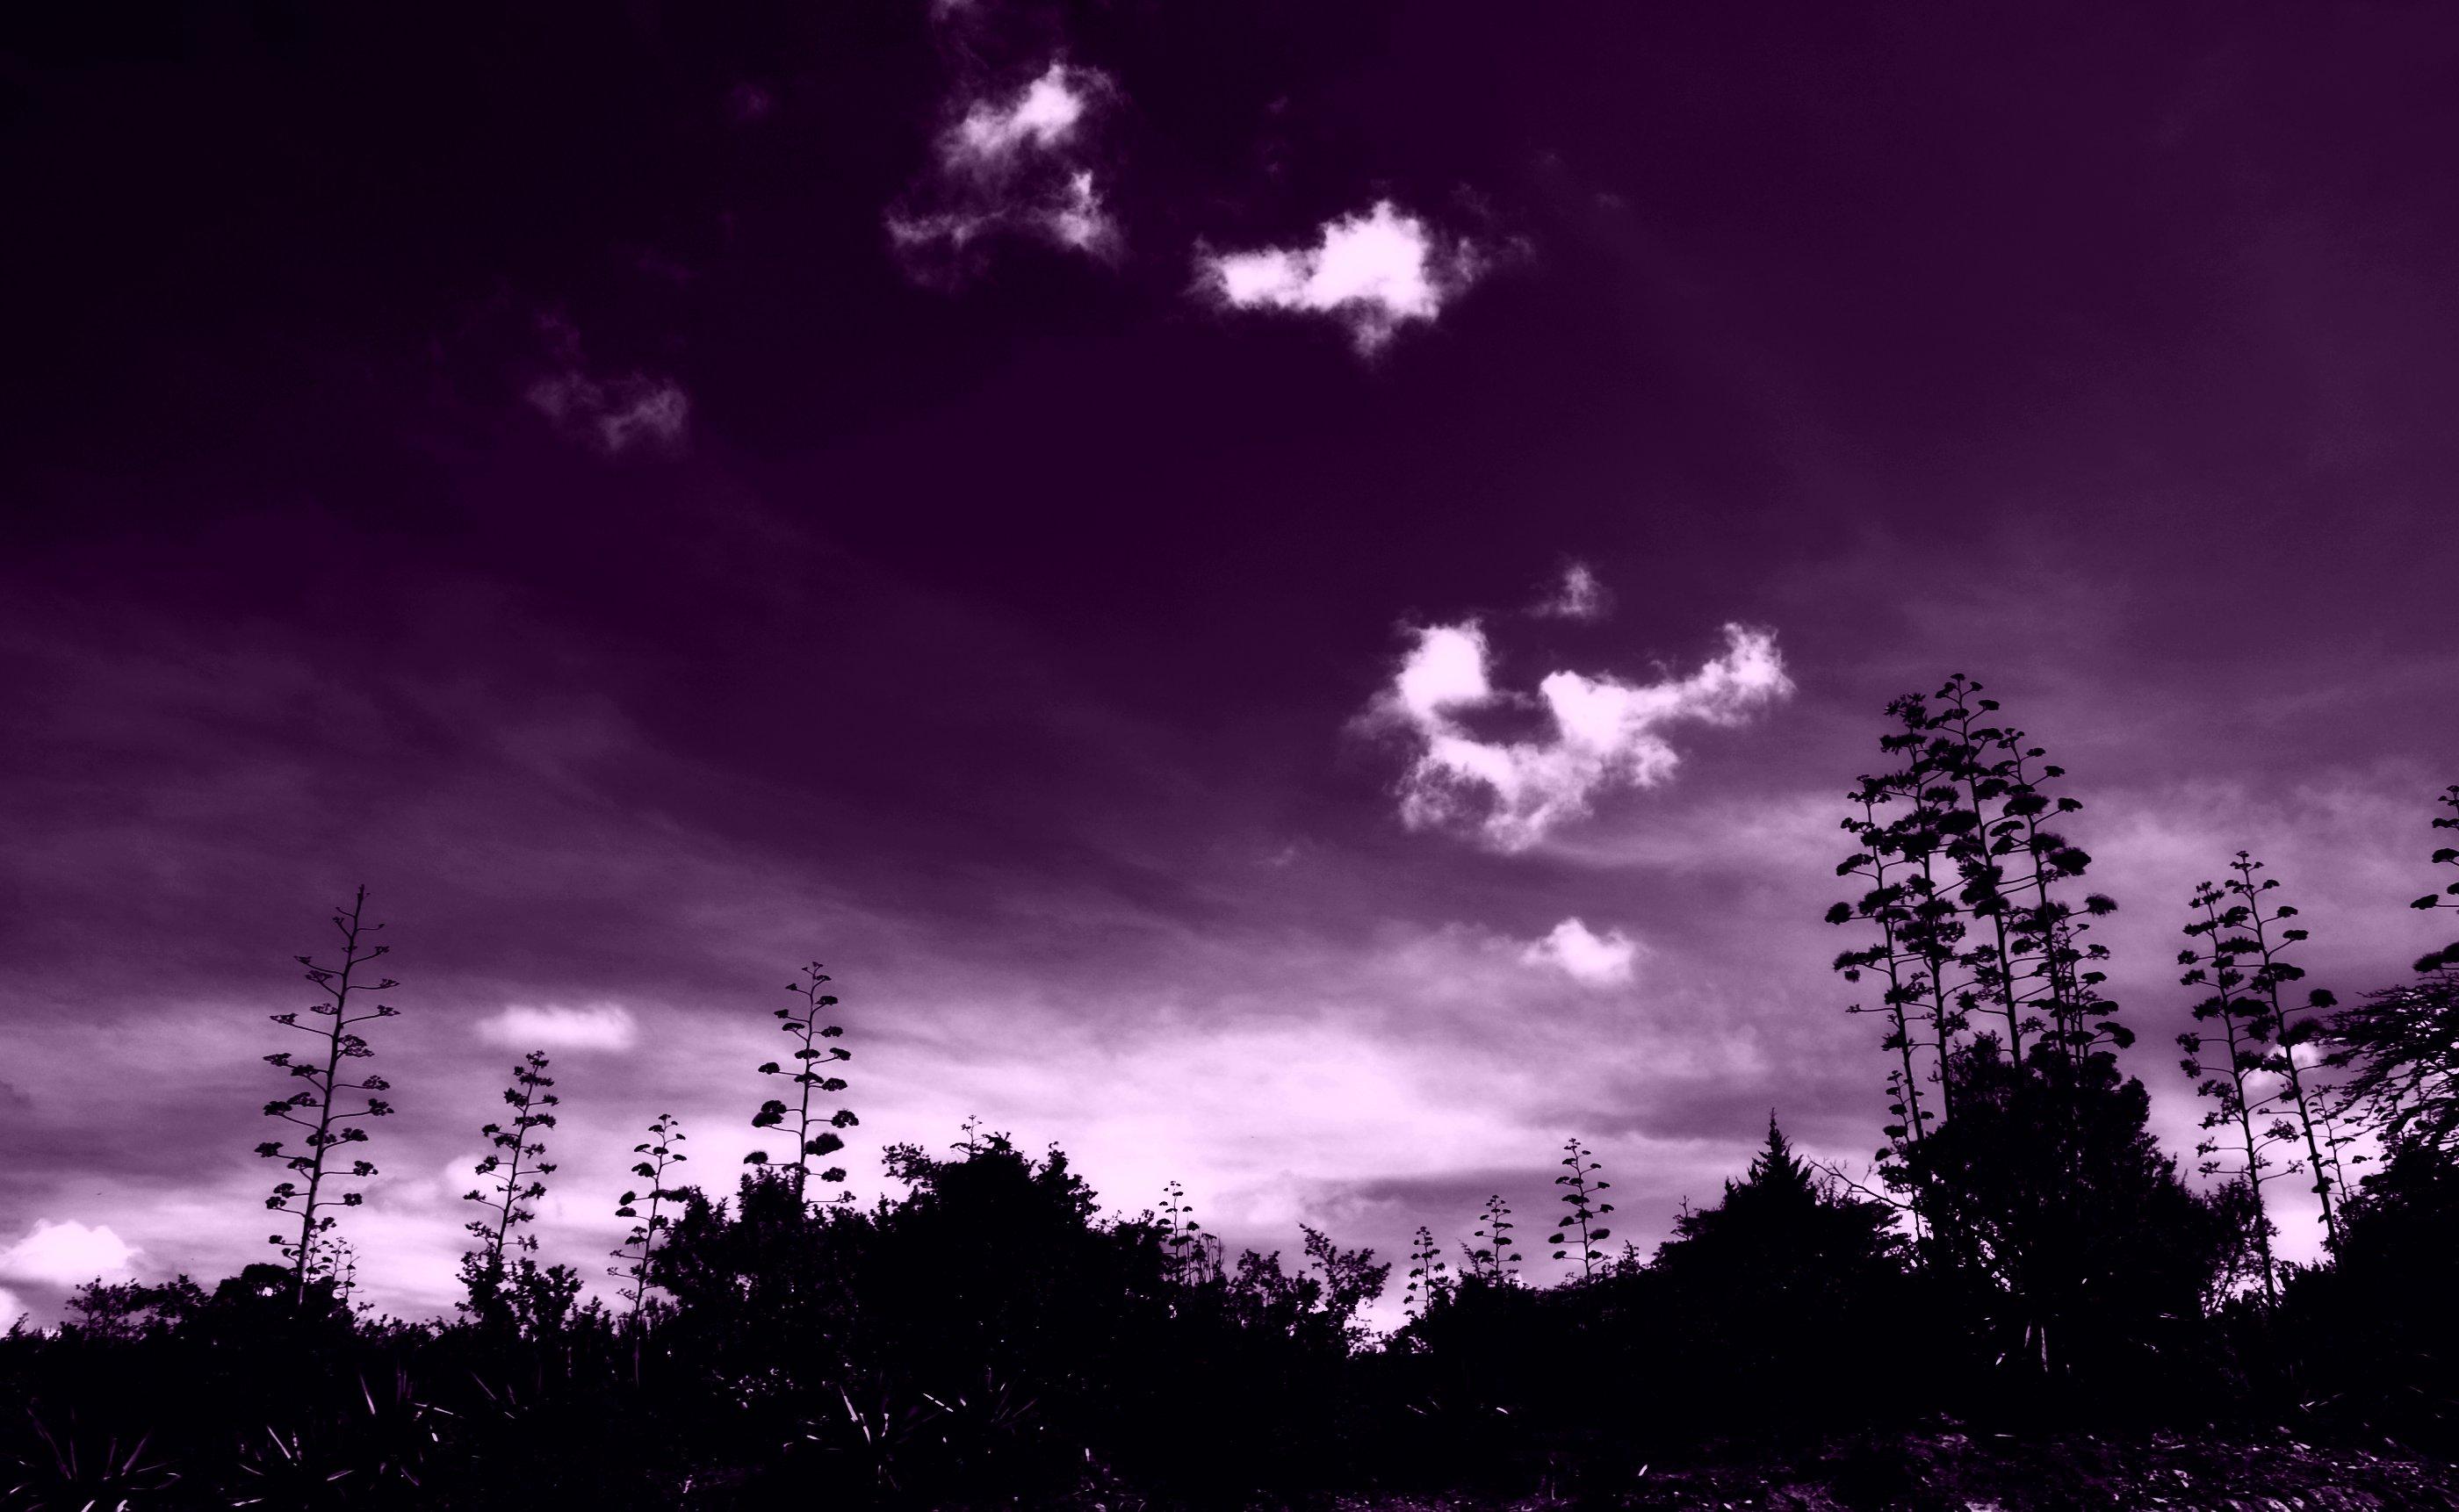 picha purple dream at masai mara jpg wikipedia kamusi elezo huru